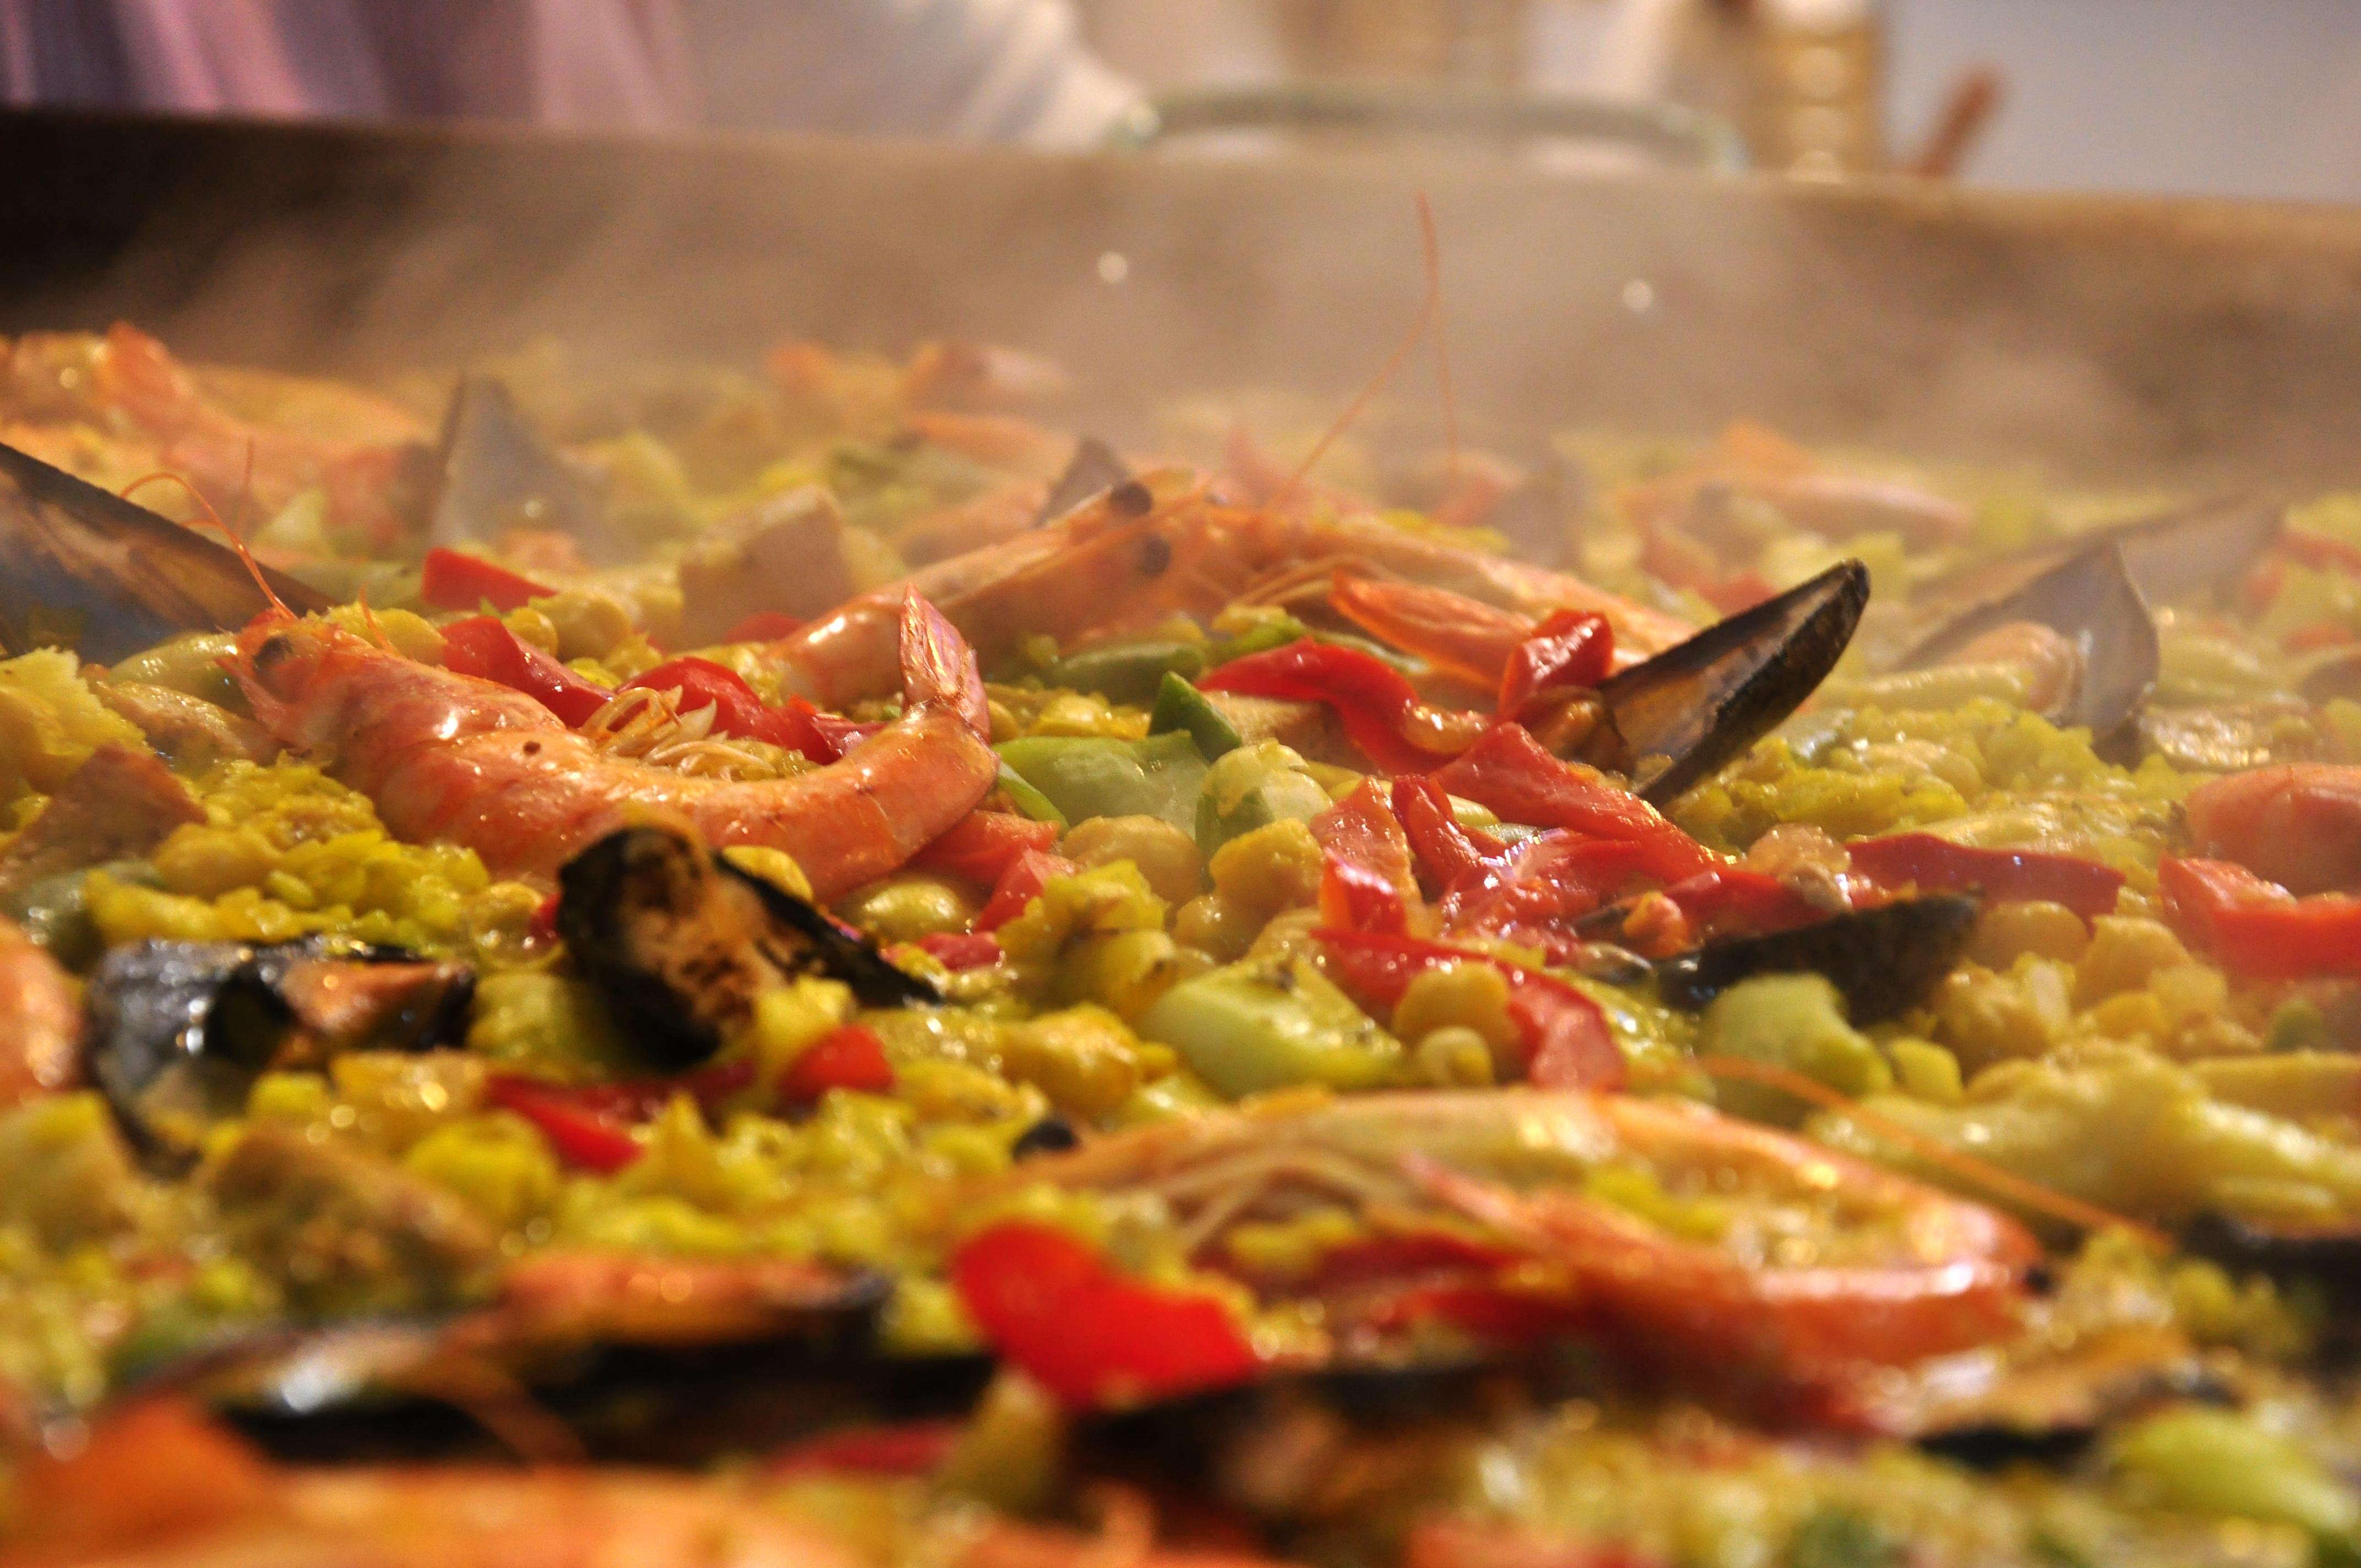 Spanish Eating Customs: Tapas